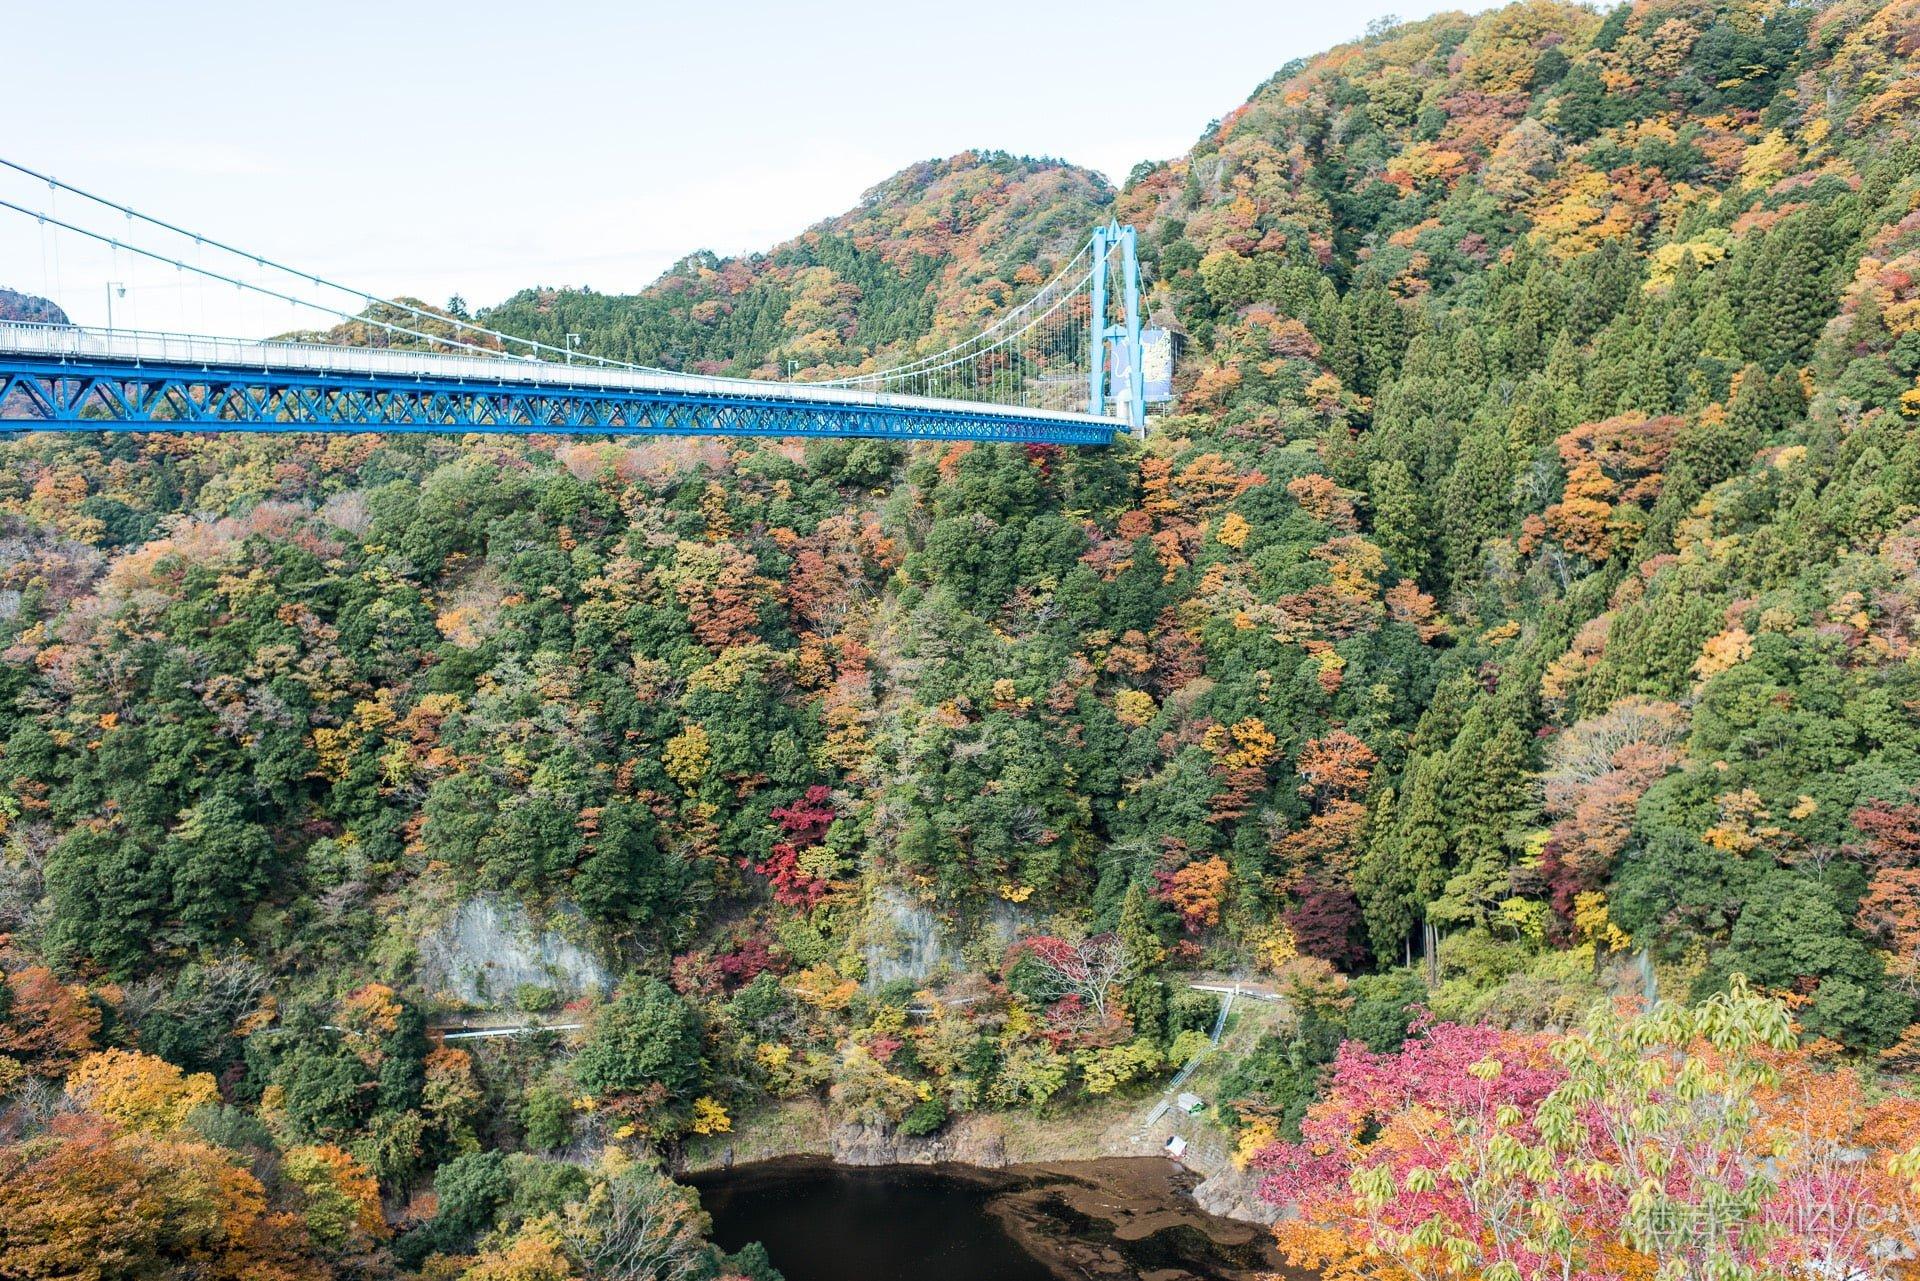 201711 Ibaraki Tochigi Gunma Japan Travel By RentalCar 27 日本自駕旅遊/北關東三縣「茨城、櫪木、群馬」秋天美食、溫泉與瀑布秘境百景(精選照片分享)